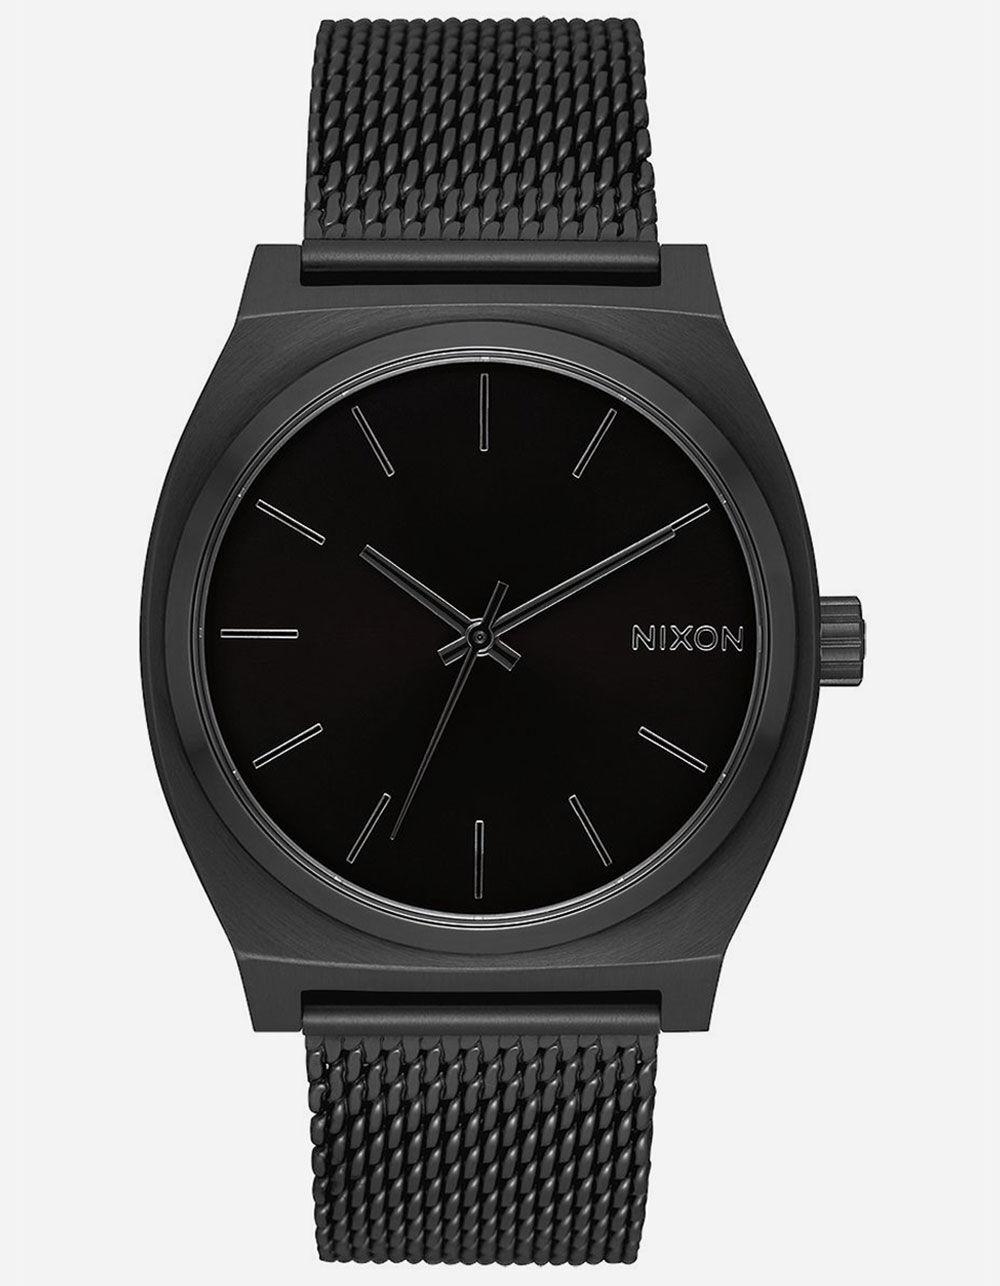 NIXON Time Teller Milanese All Black Watch